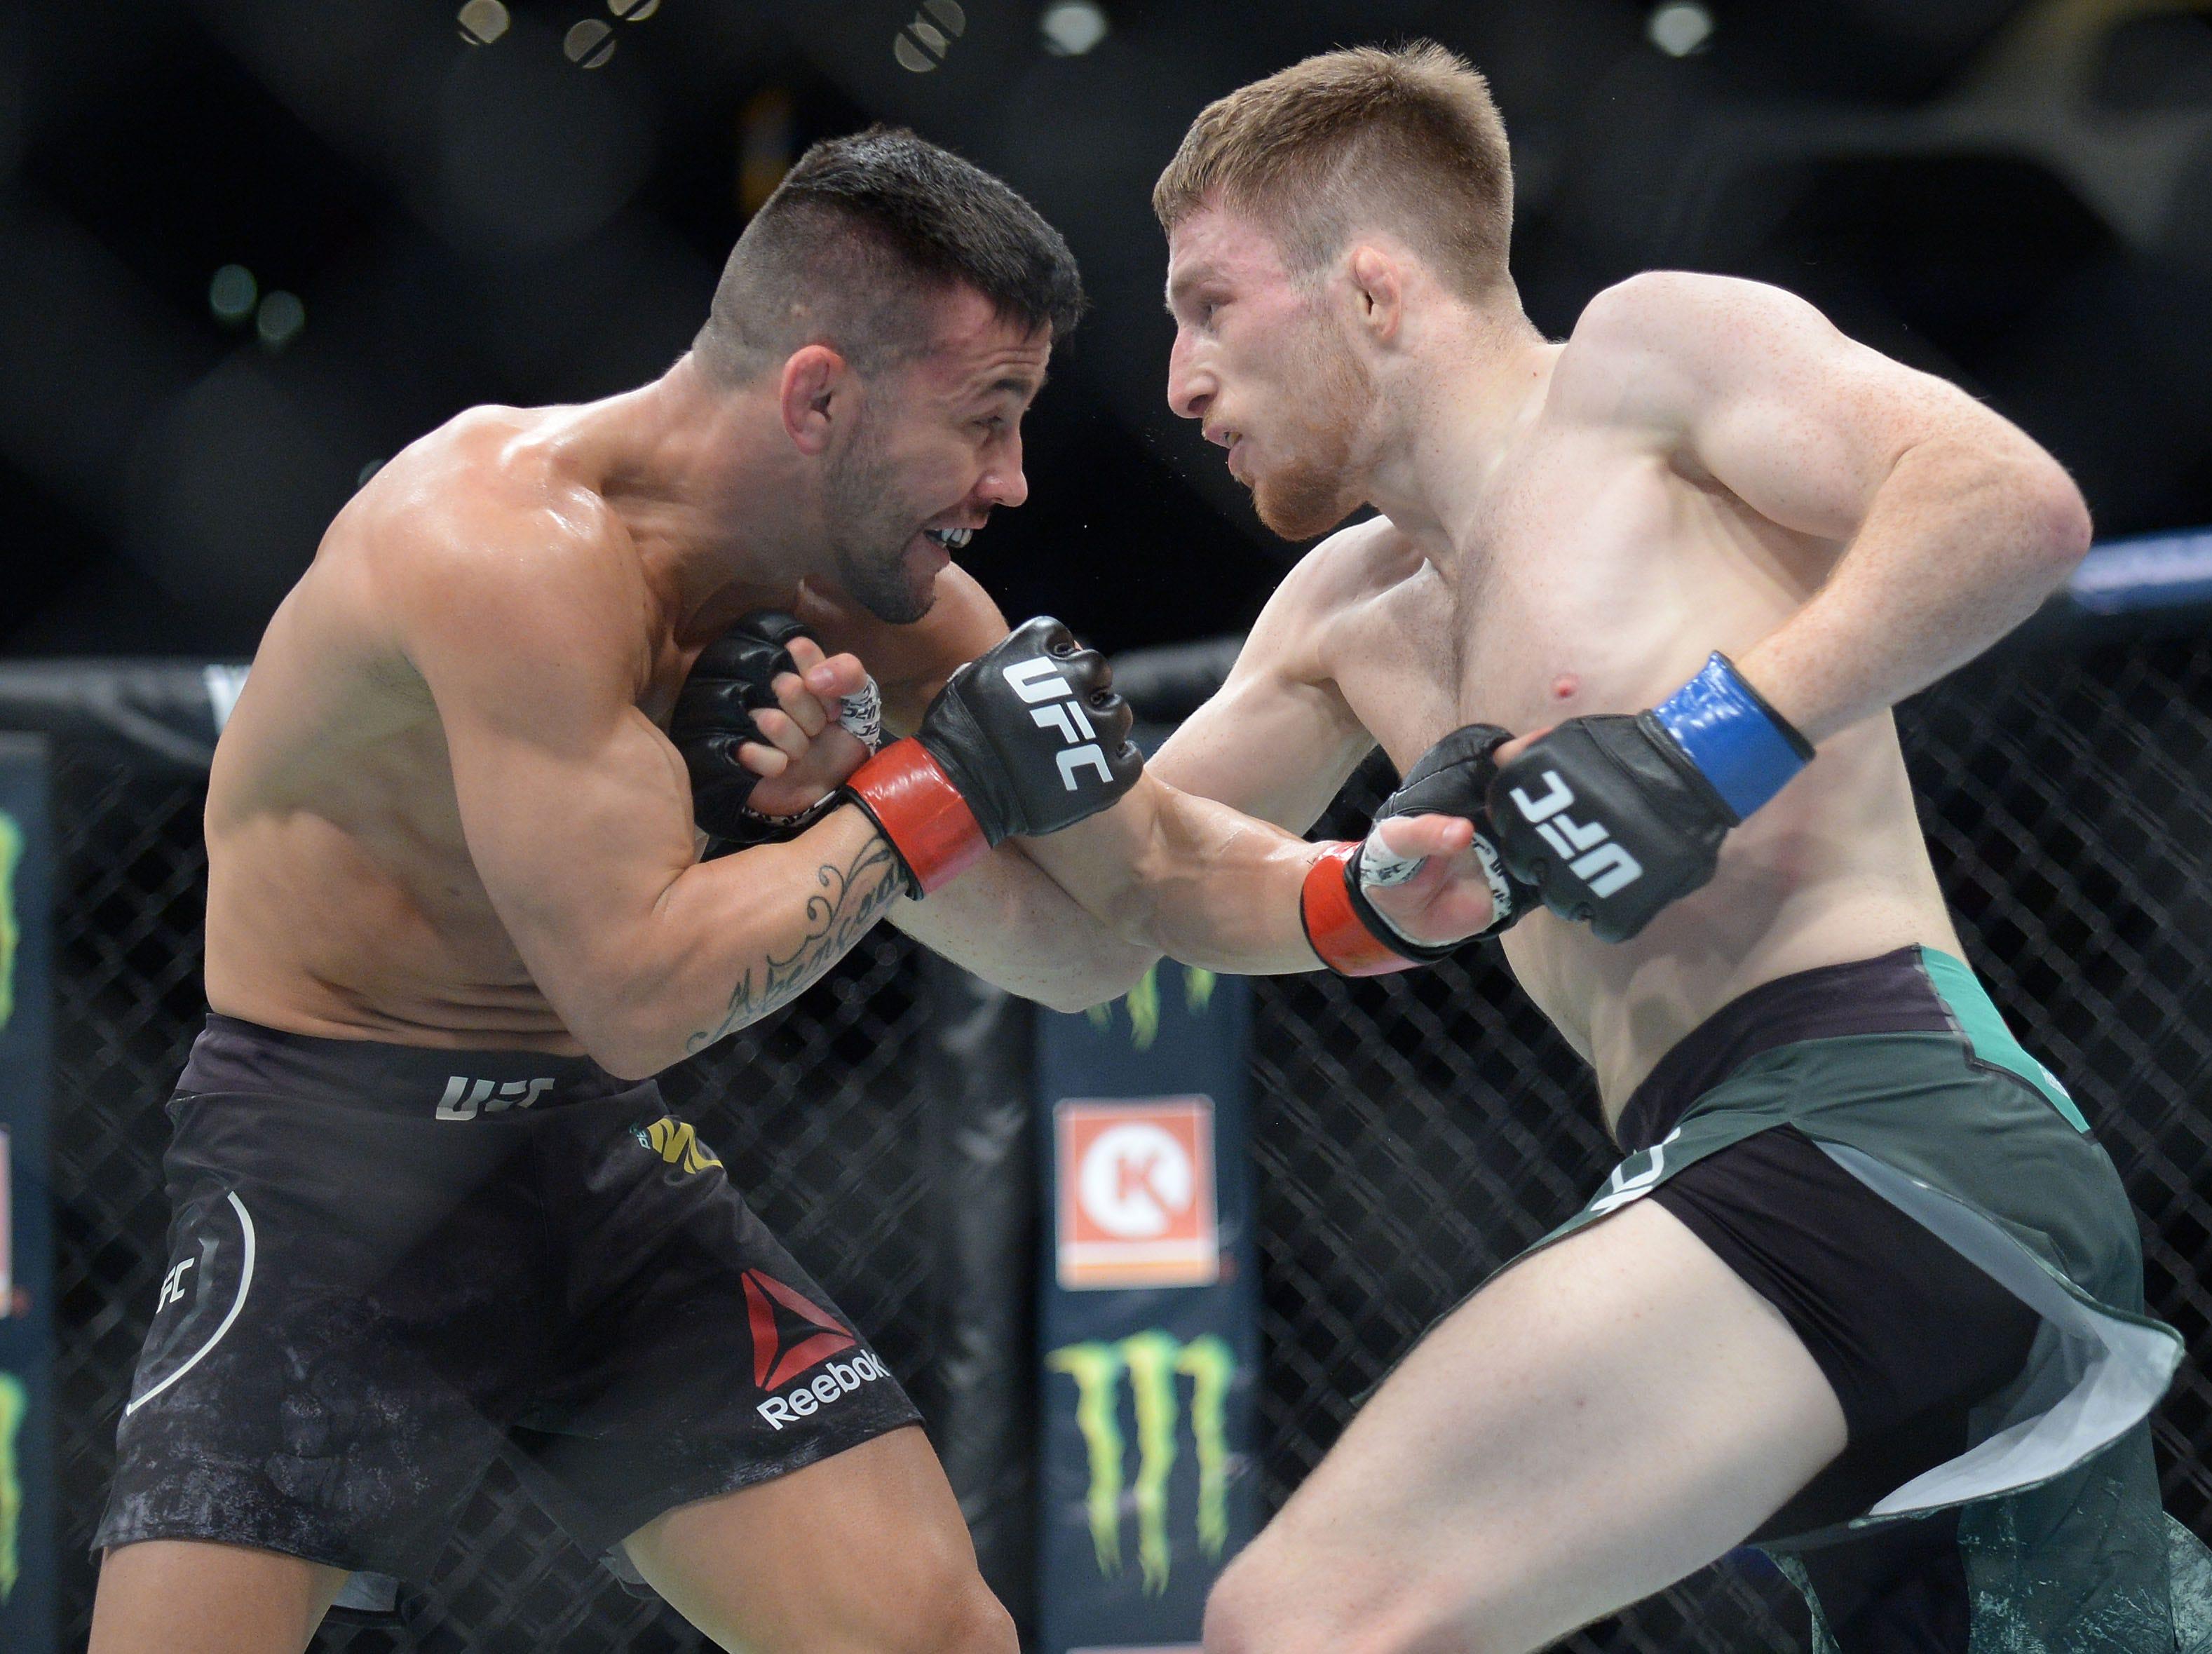 Brett Johns moves in as Pedro Munhoz defends during UFC 227 at Staples Center.